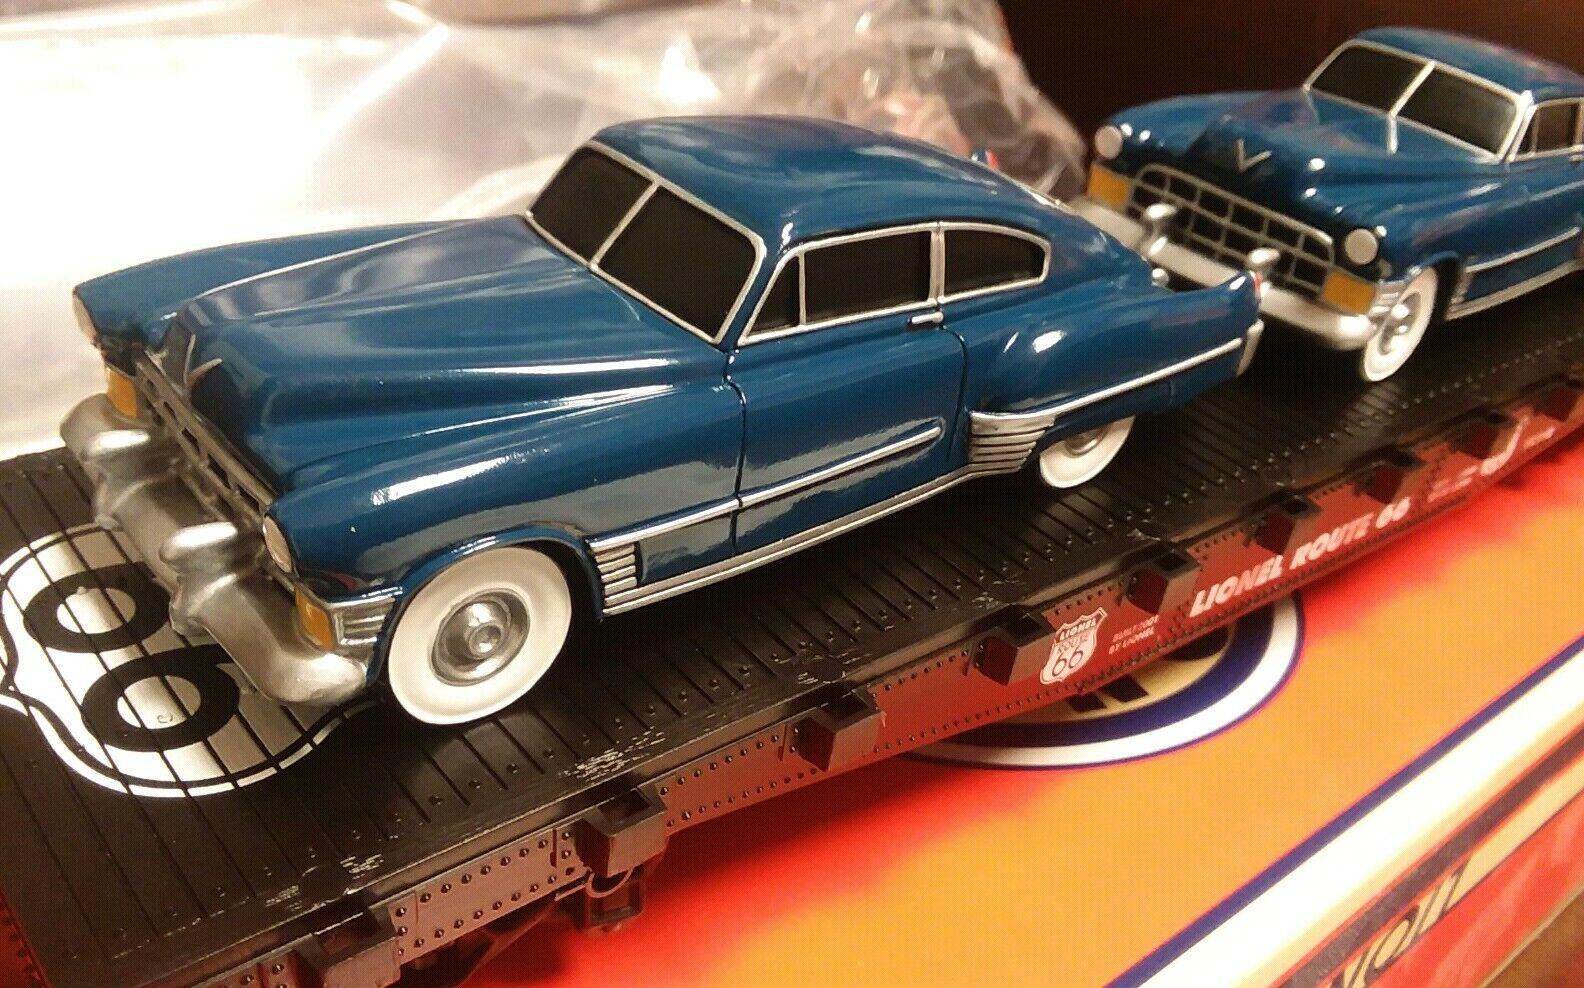 Lionel 6-17560 Carro W 2 ruta 66 sedanes